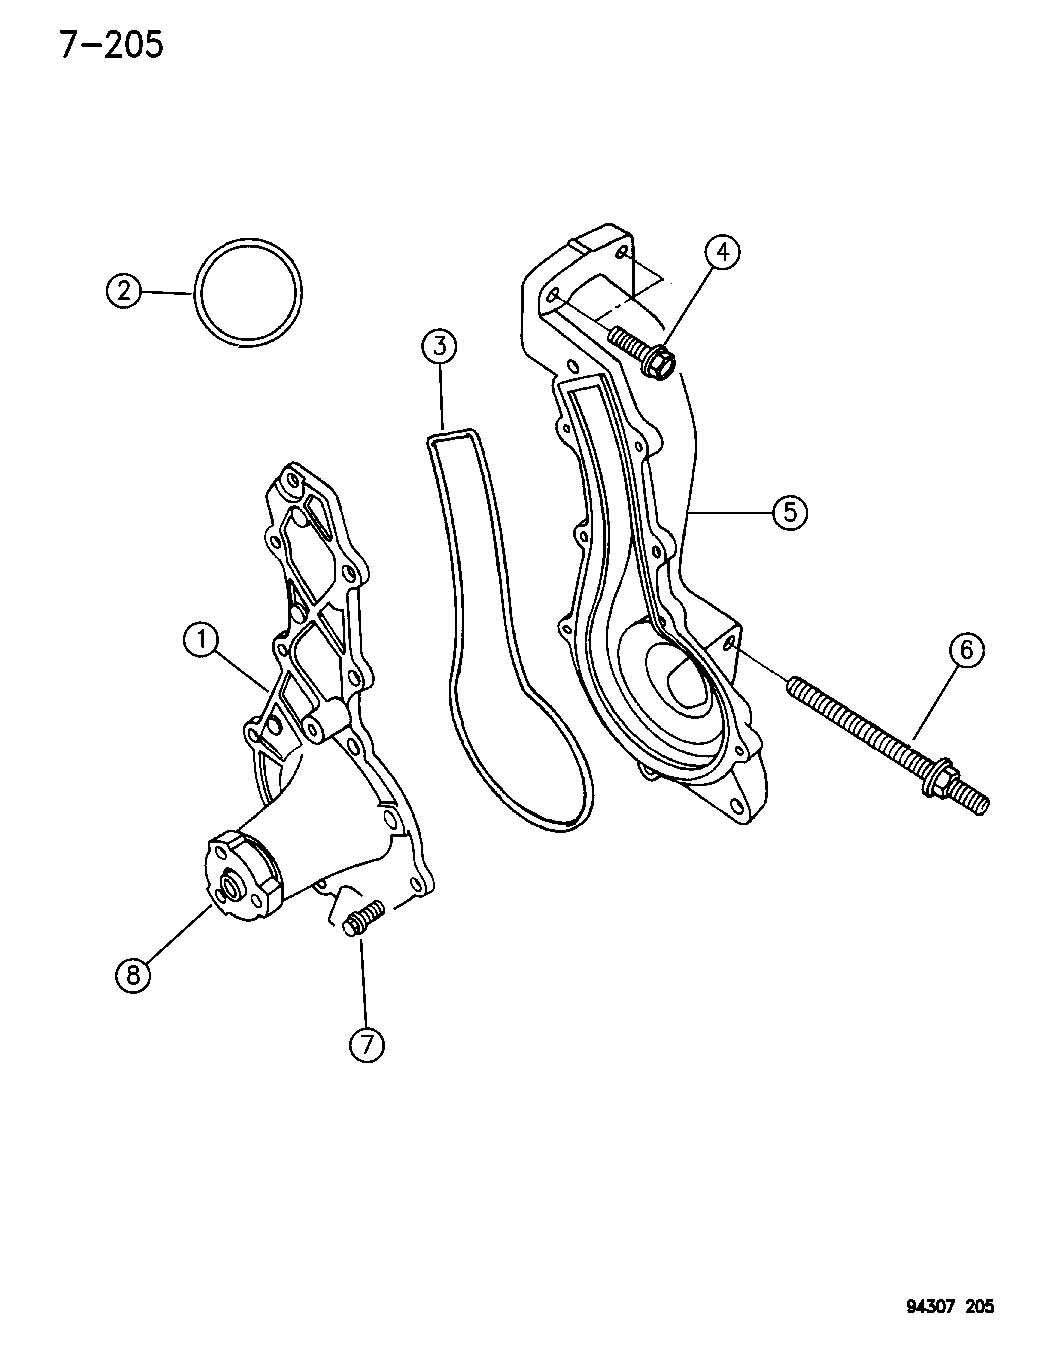 87 Jeep Cherokee Fuse Box Diagram, 87, Get Free Image